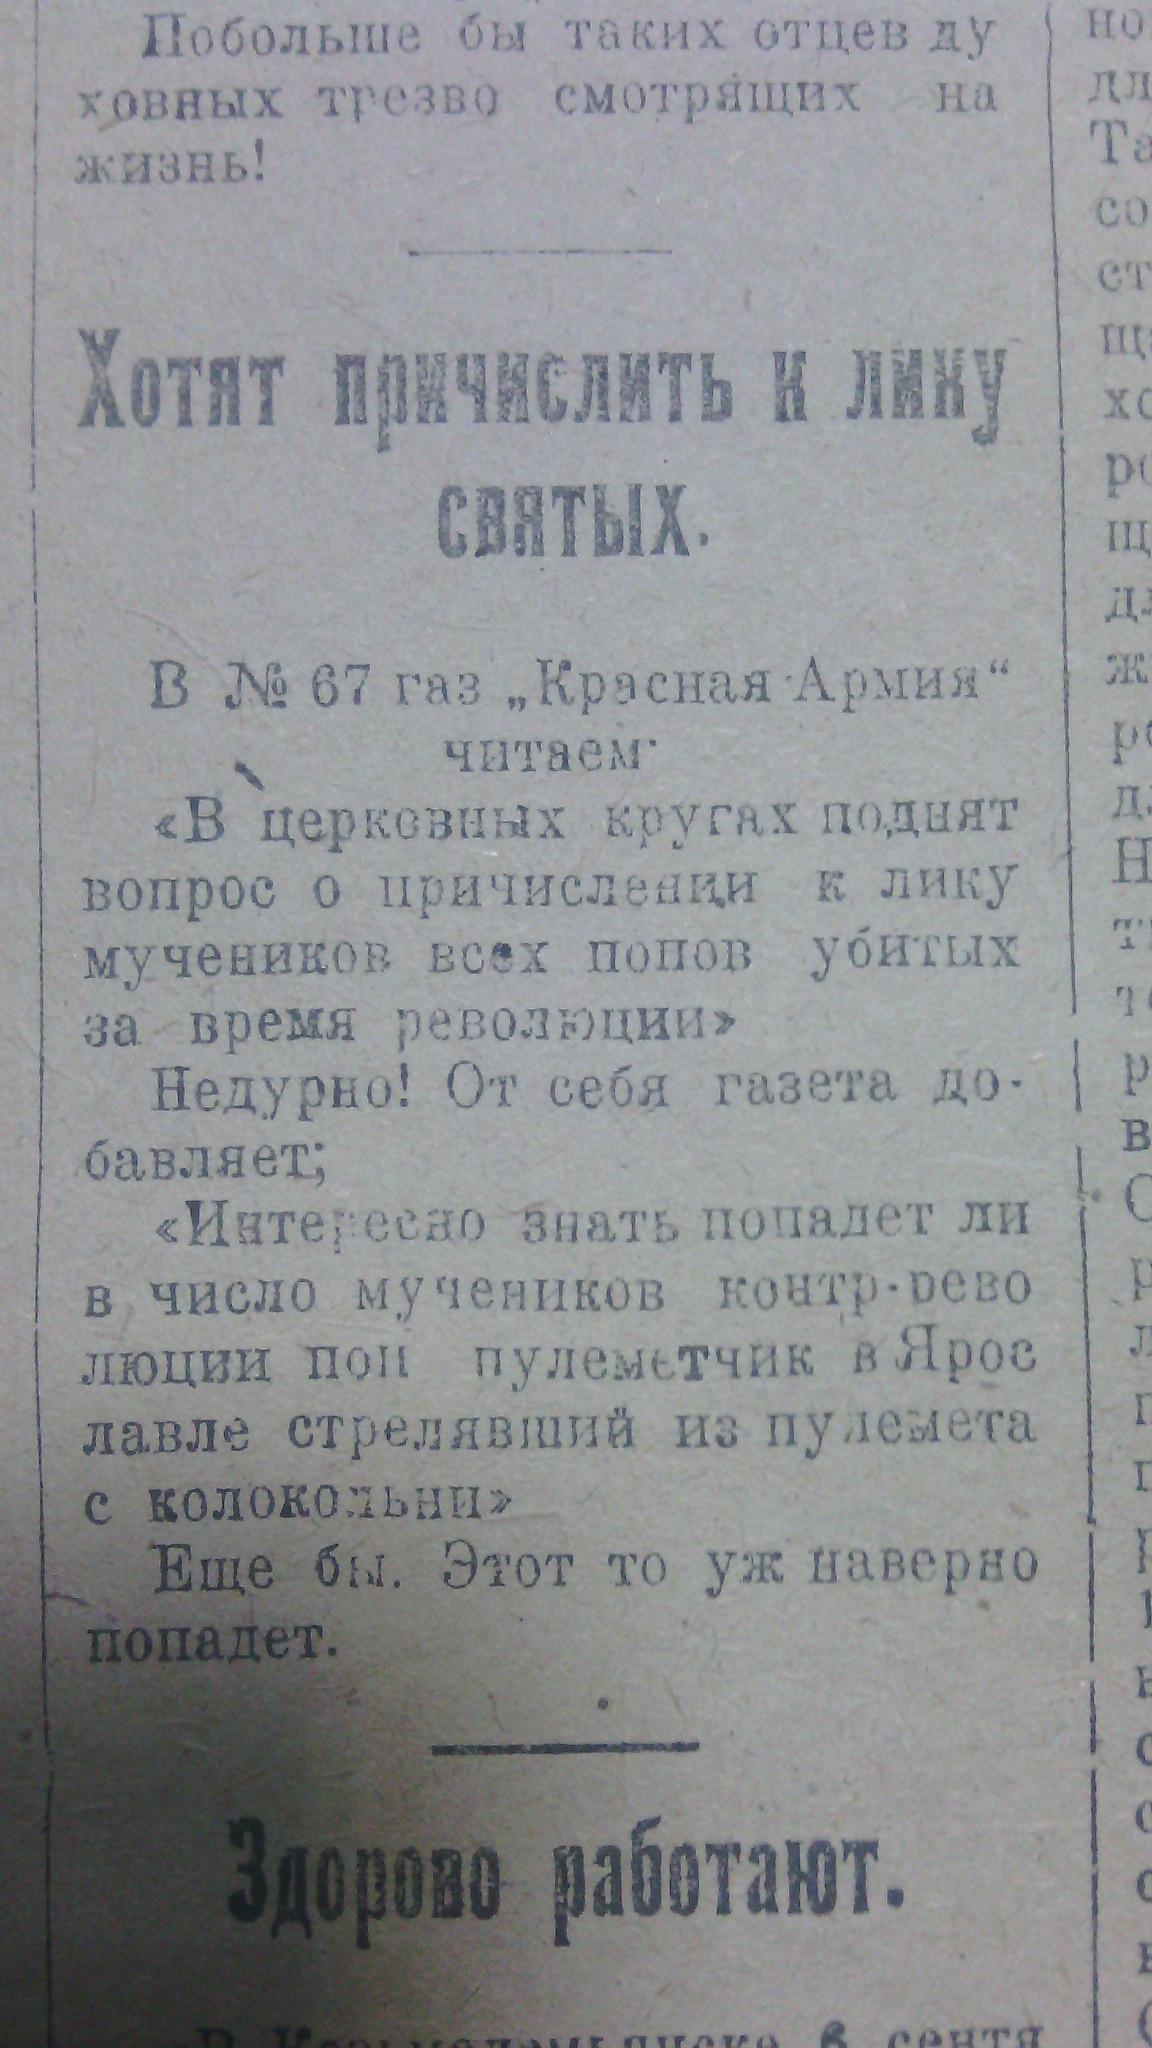 Усманская газета. 120. 15 (2) сентября 1918 г.